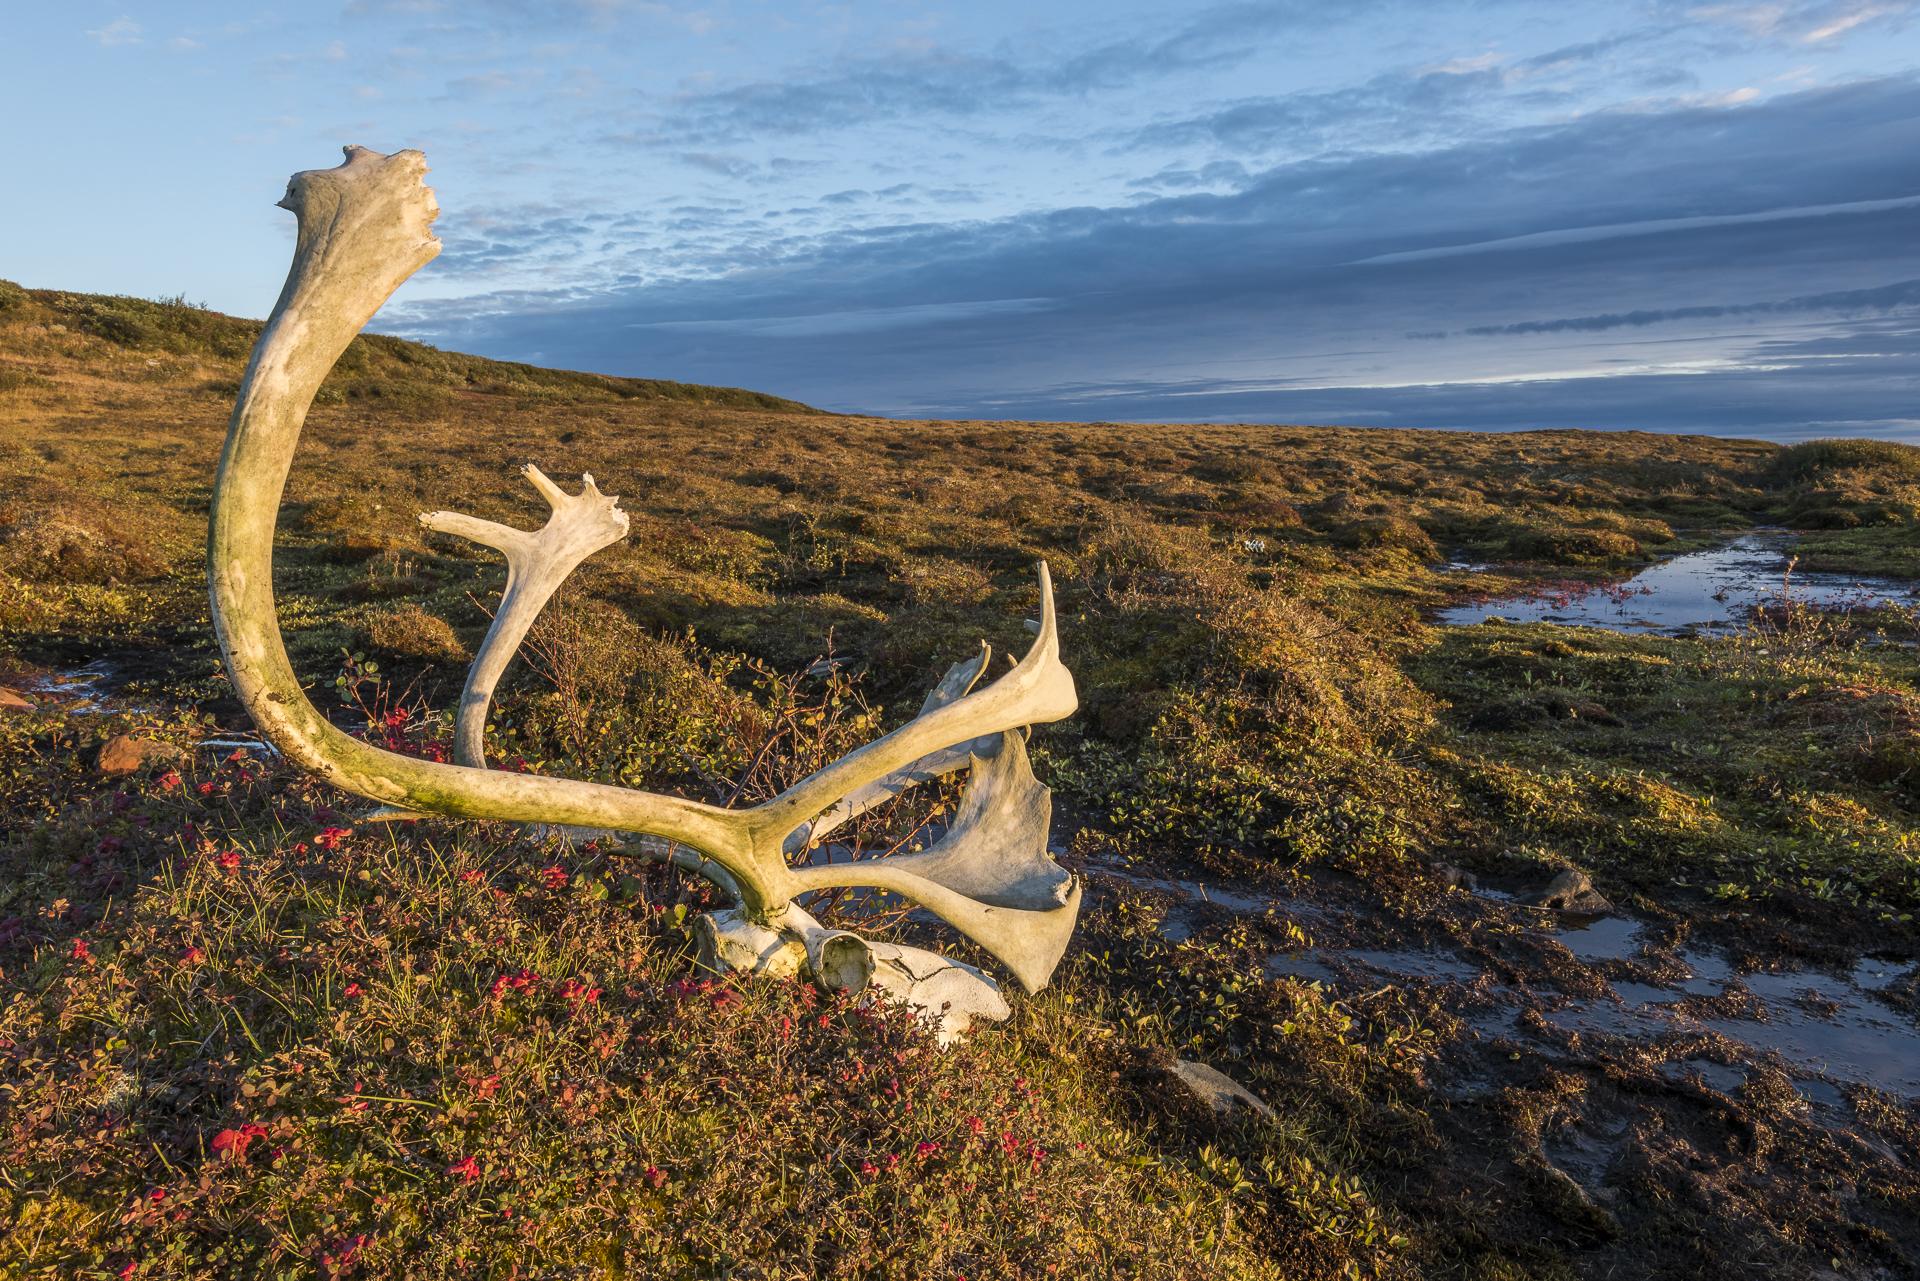 Caribou skull: Nunavik region, northern Quebec, Canada.